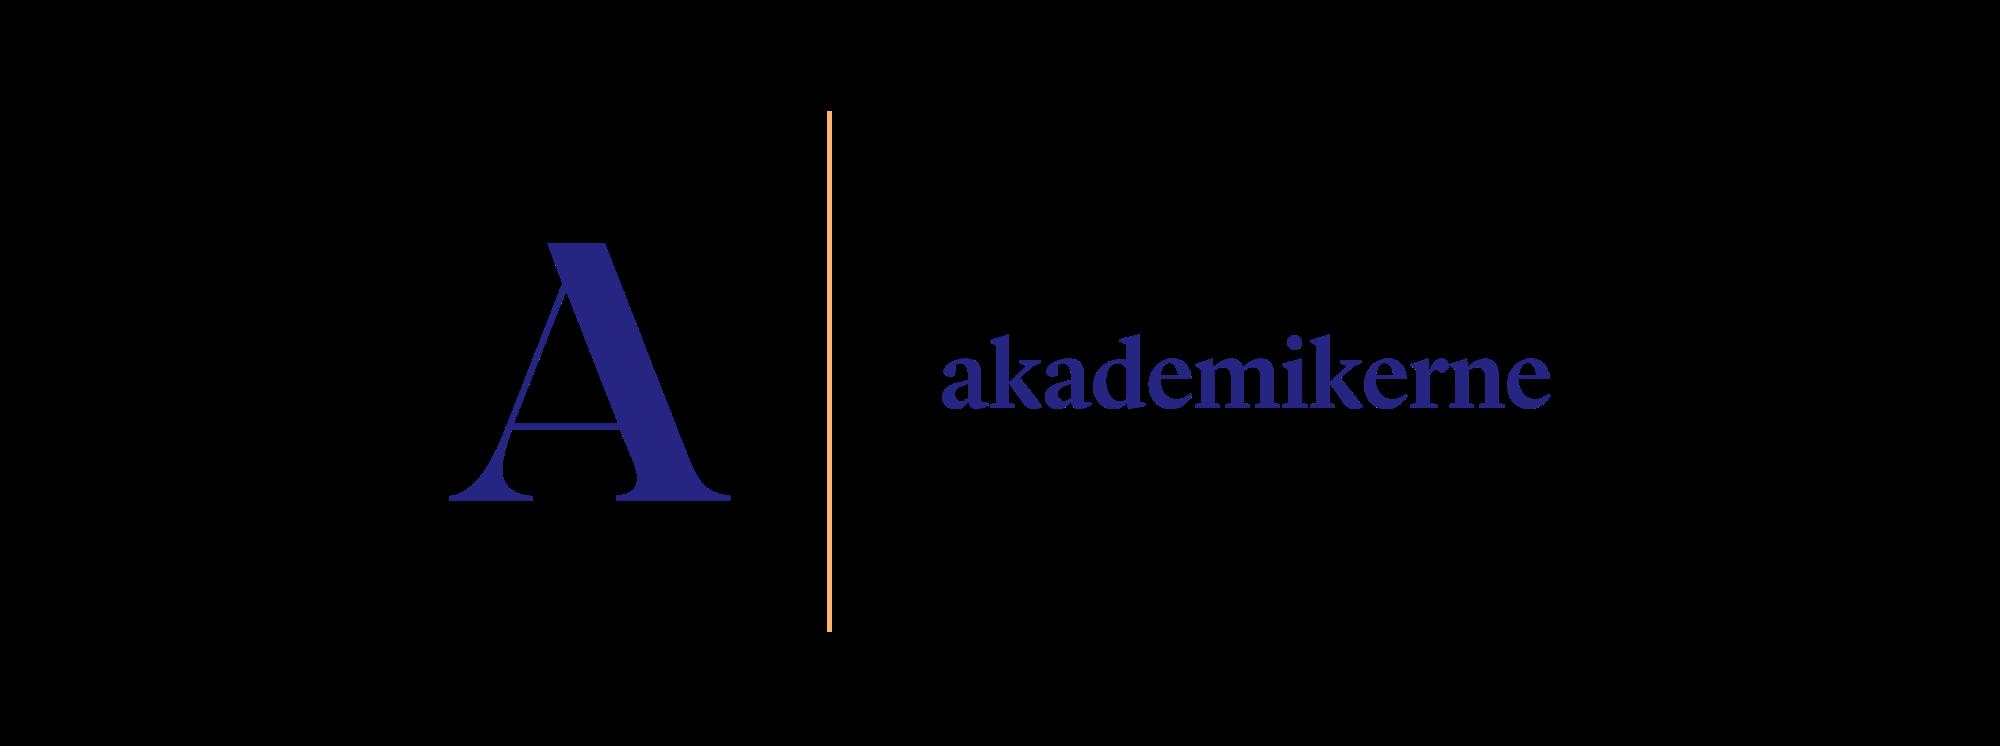 Akademikernes logo